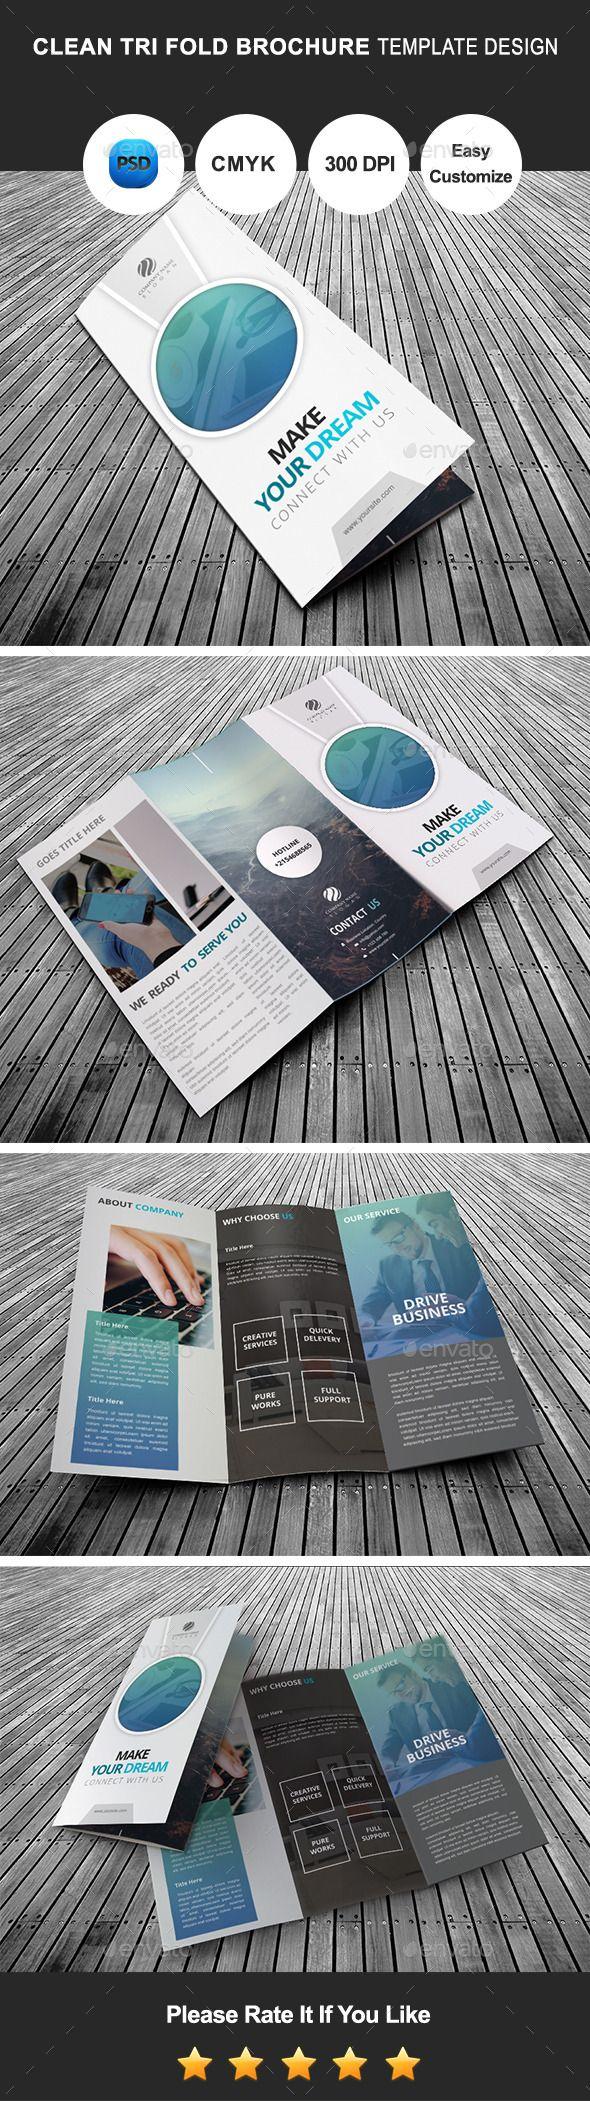 Clean Tri Fold Brochure Template Design — Photoshop PSD #modern brochure #creative brochure • Available here → https://graphicriver.net/item/clean-tri-fold-brochure-template-design/13019578?ref=pxcr